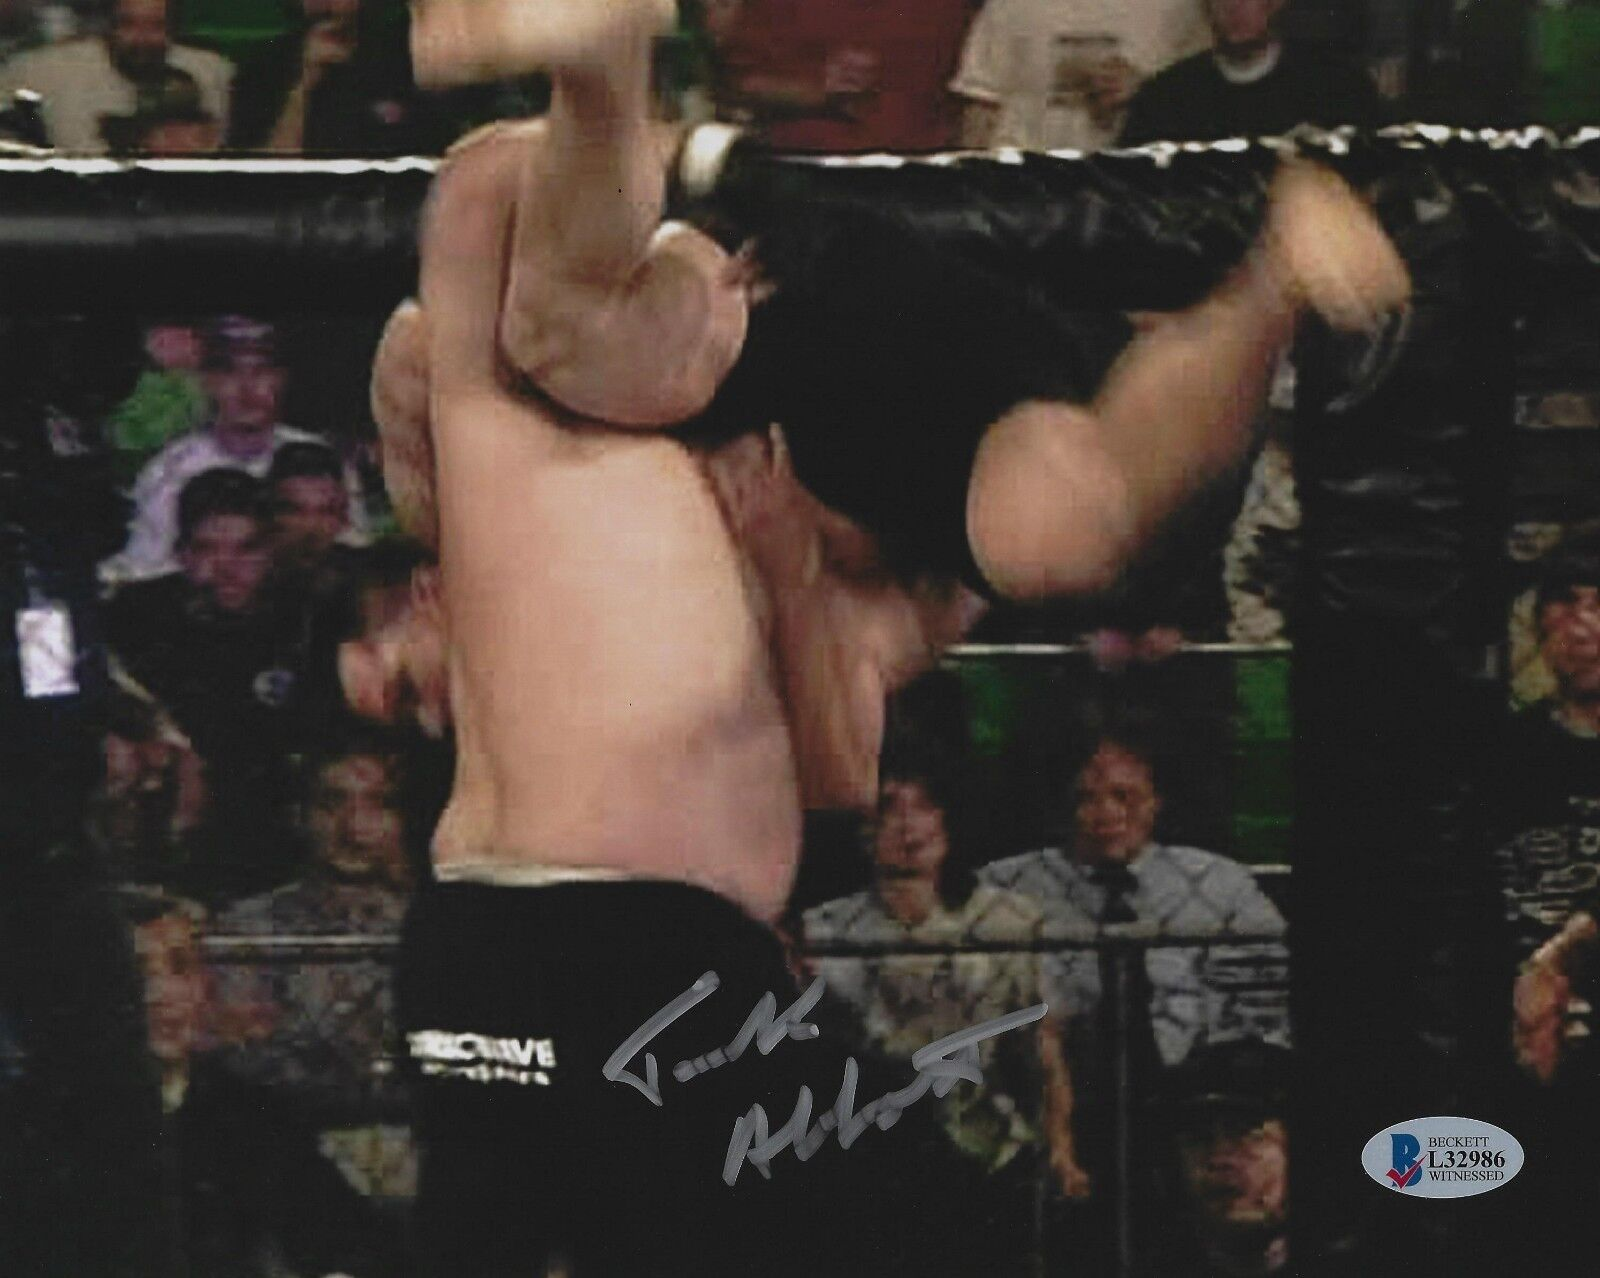 Tanque Abbott Firmado UFC 8x10 Foto Bas Beckett COA Uu96 Worsham Foto Autógrafo